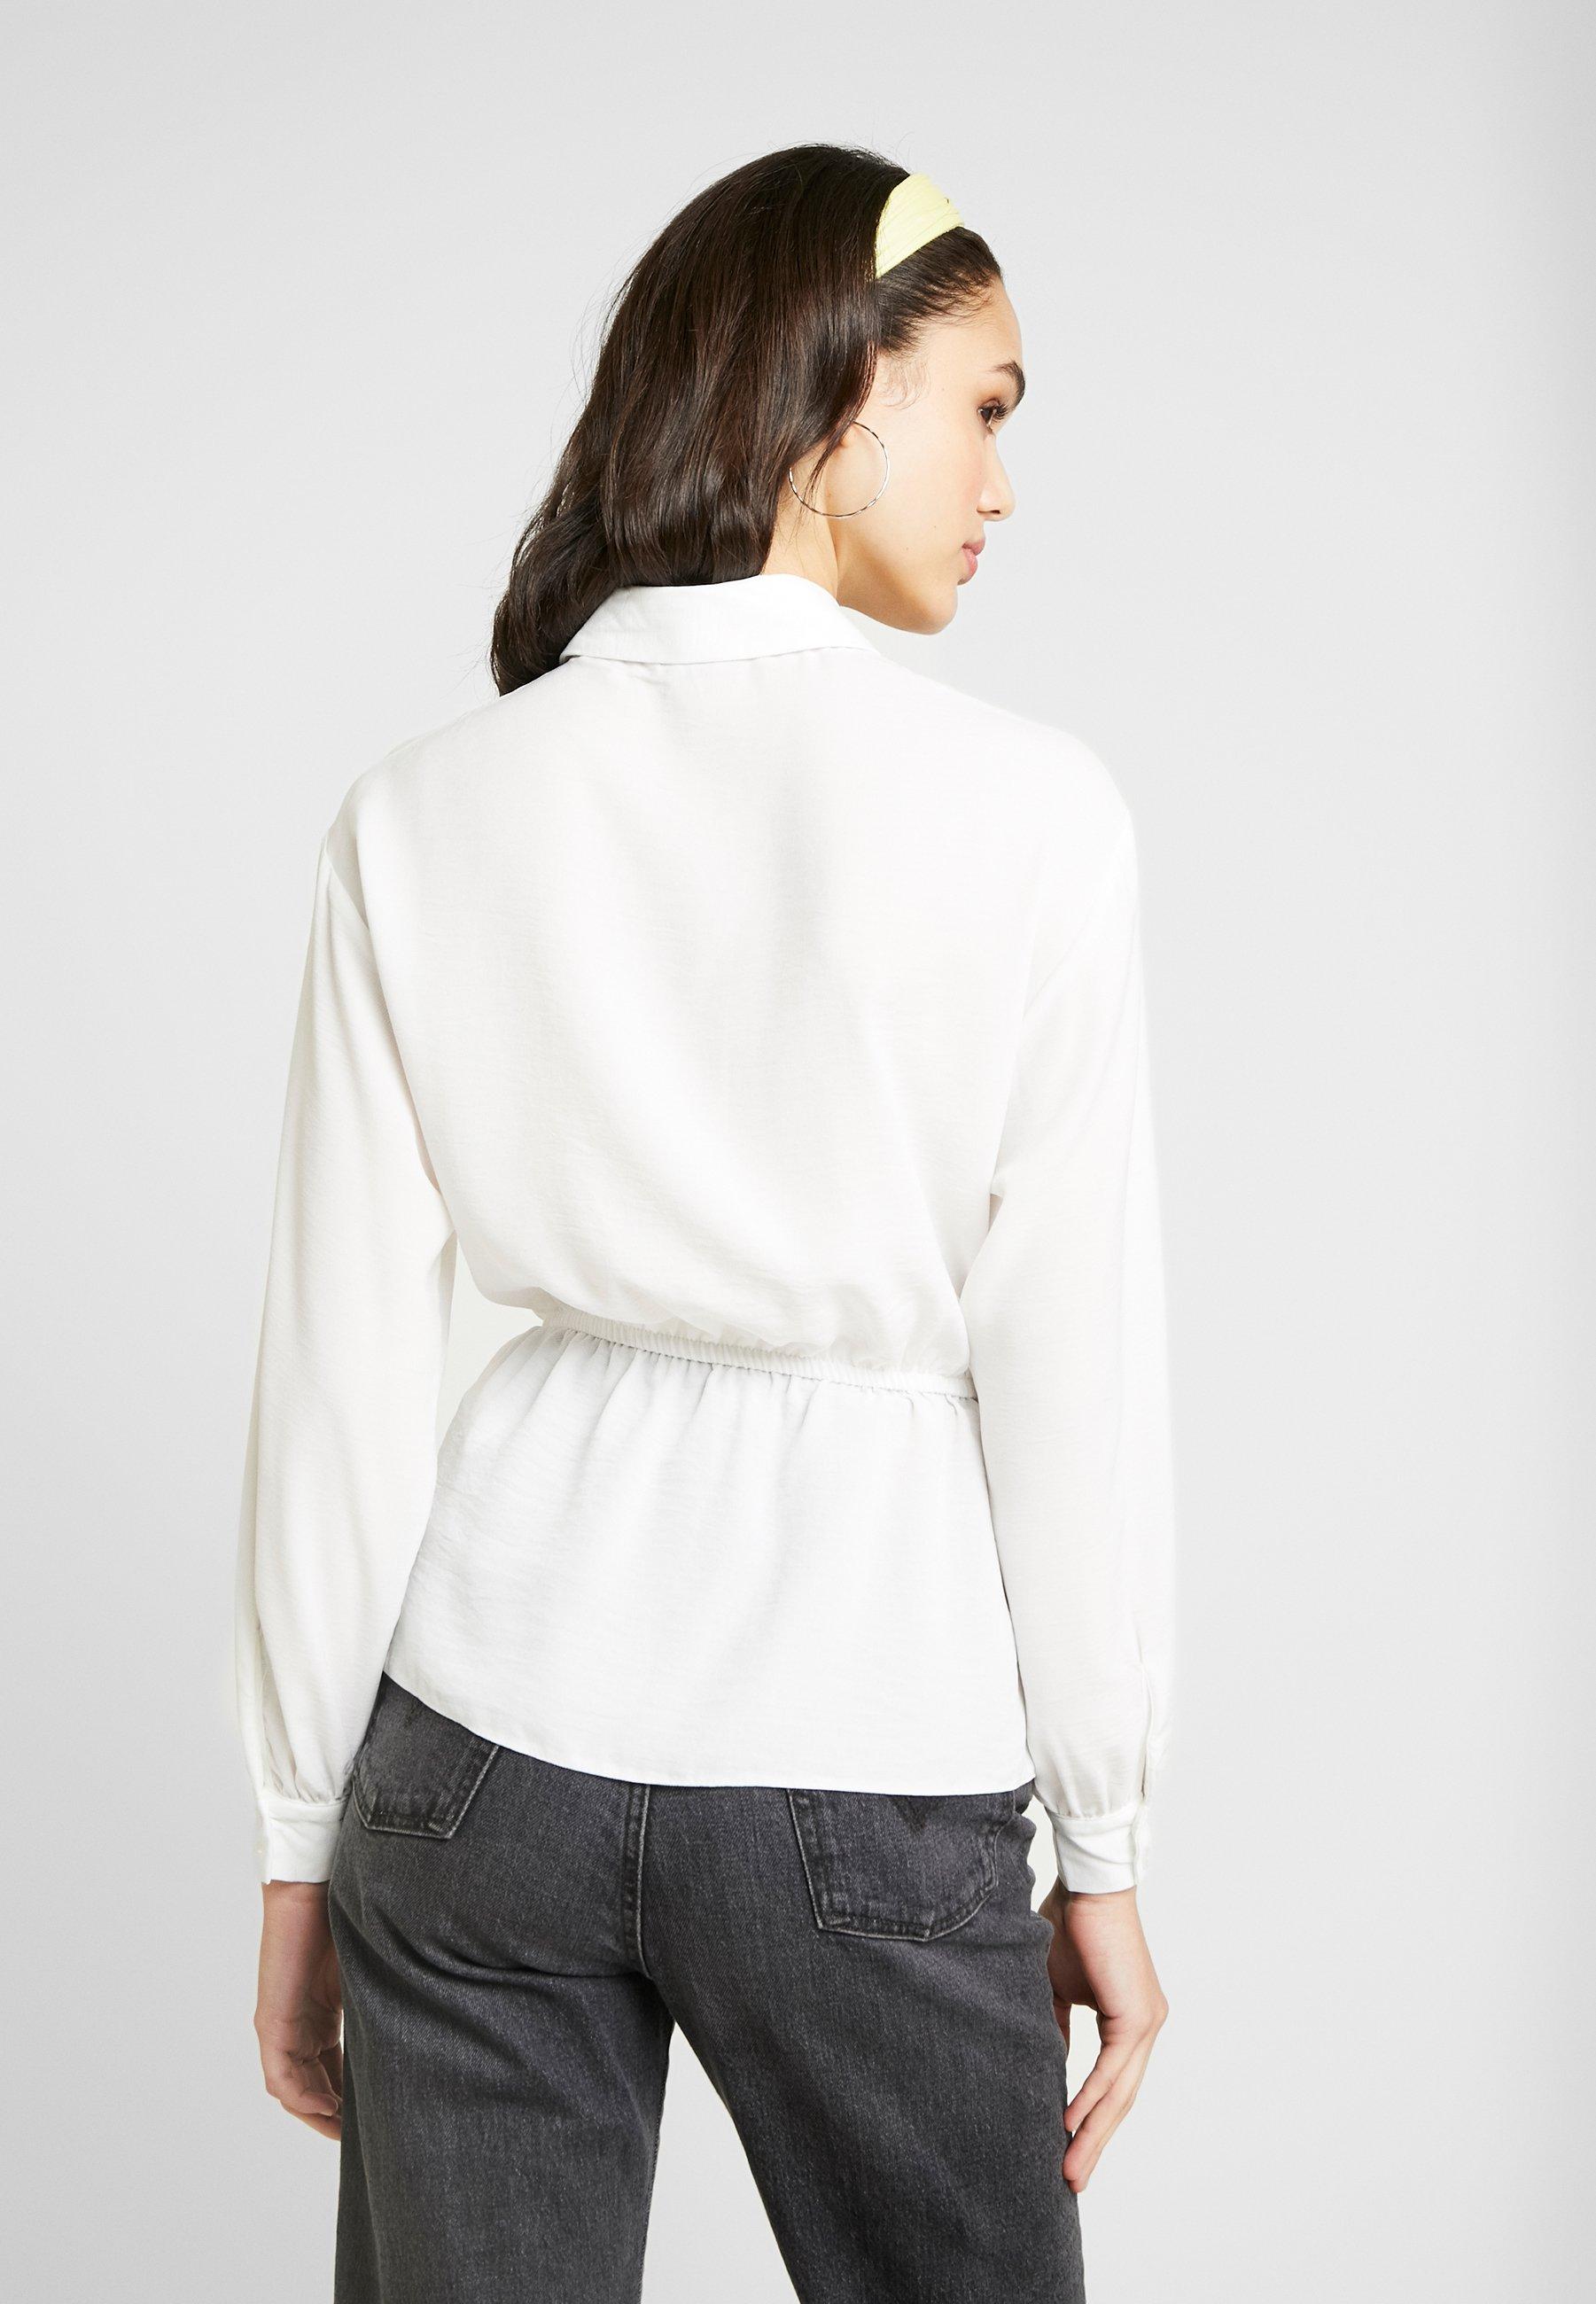 Drawstring Sleeve White Selfridge Miss ShirtCamicia Long wlkTuOPXZi